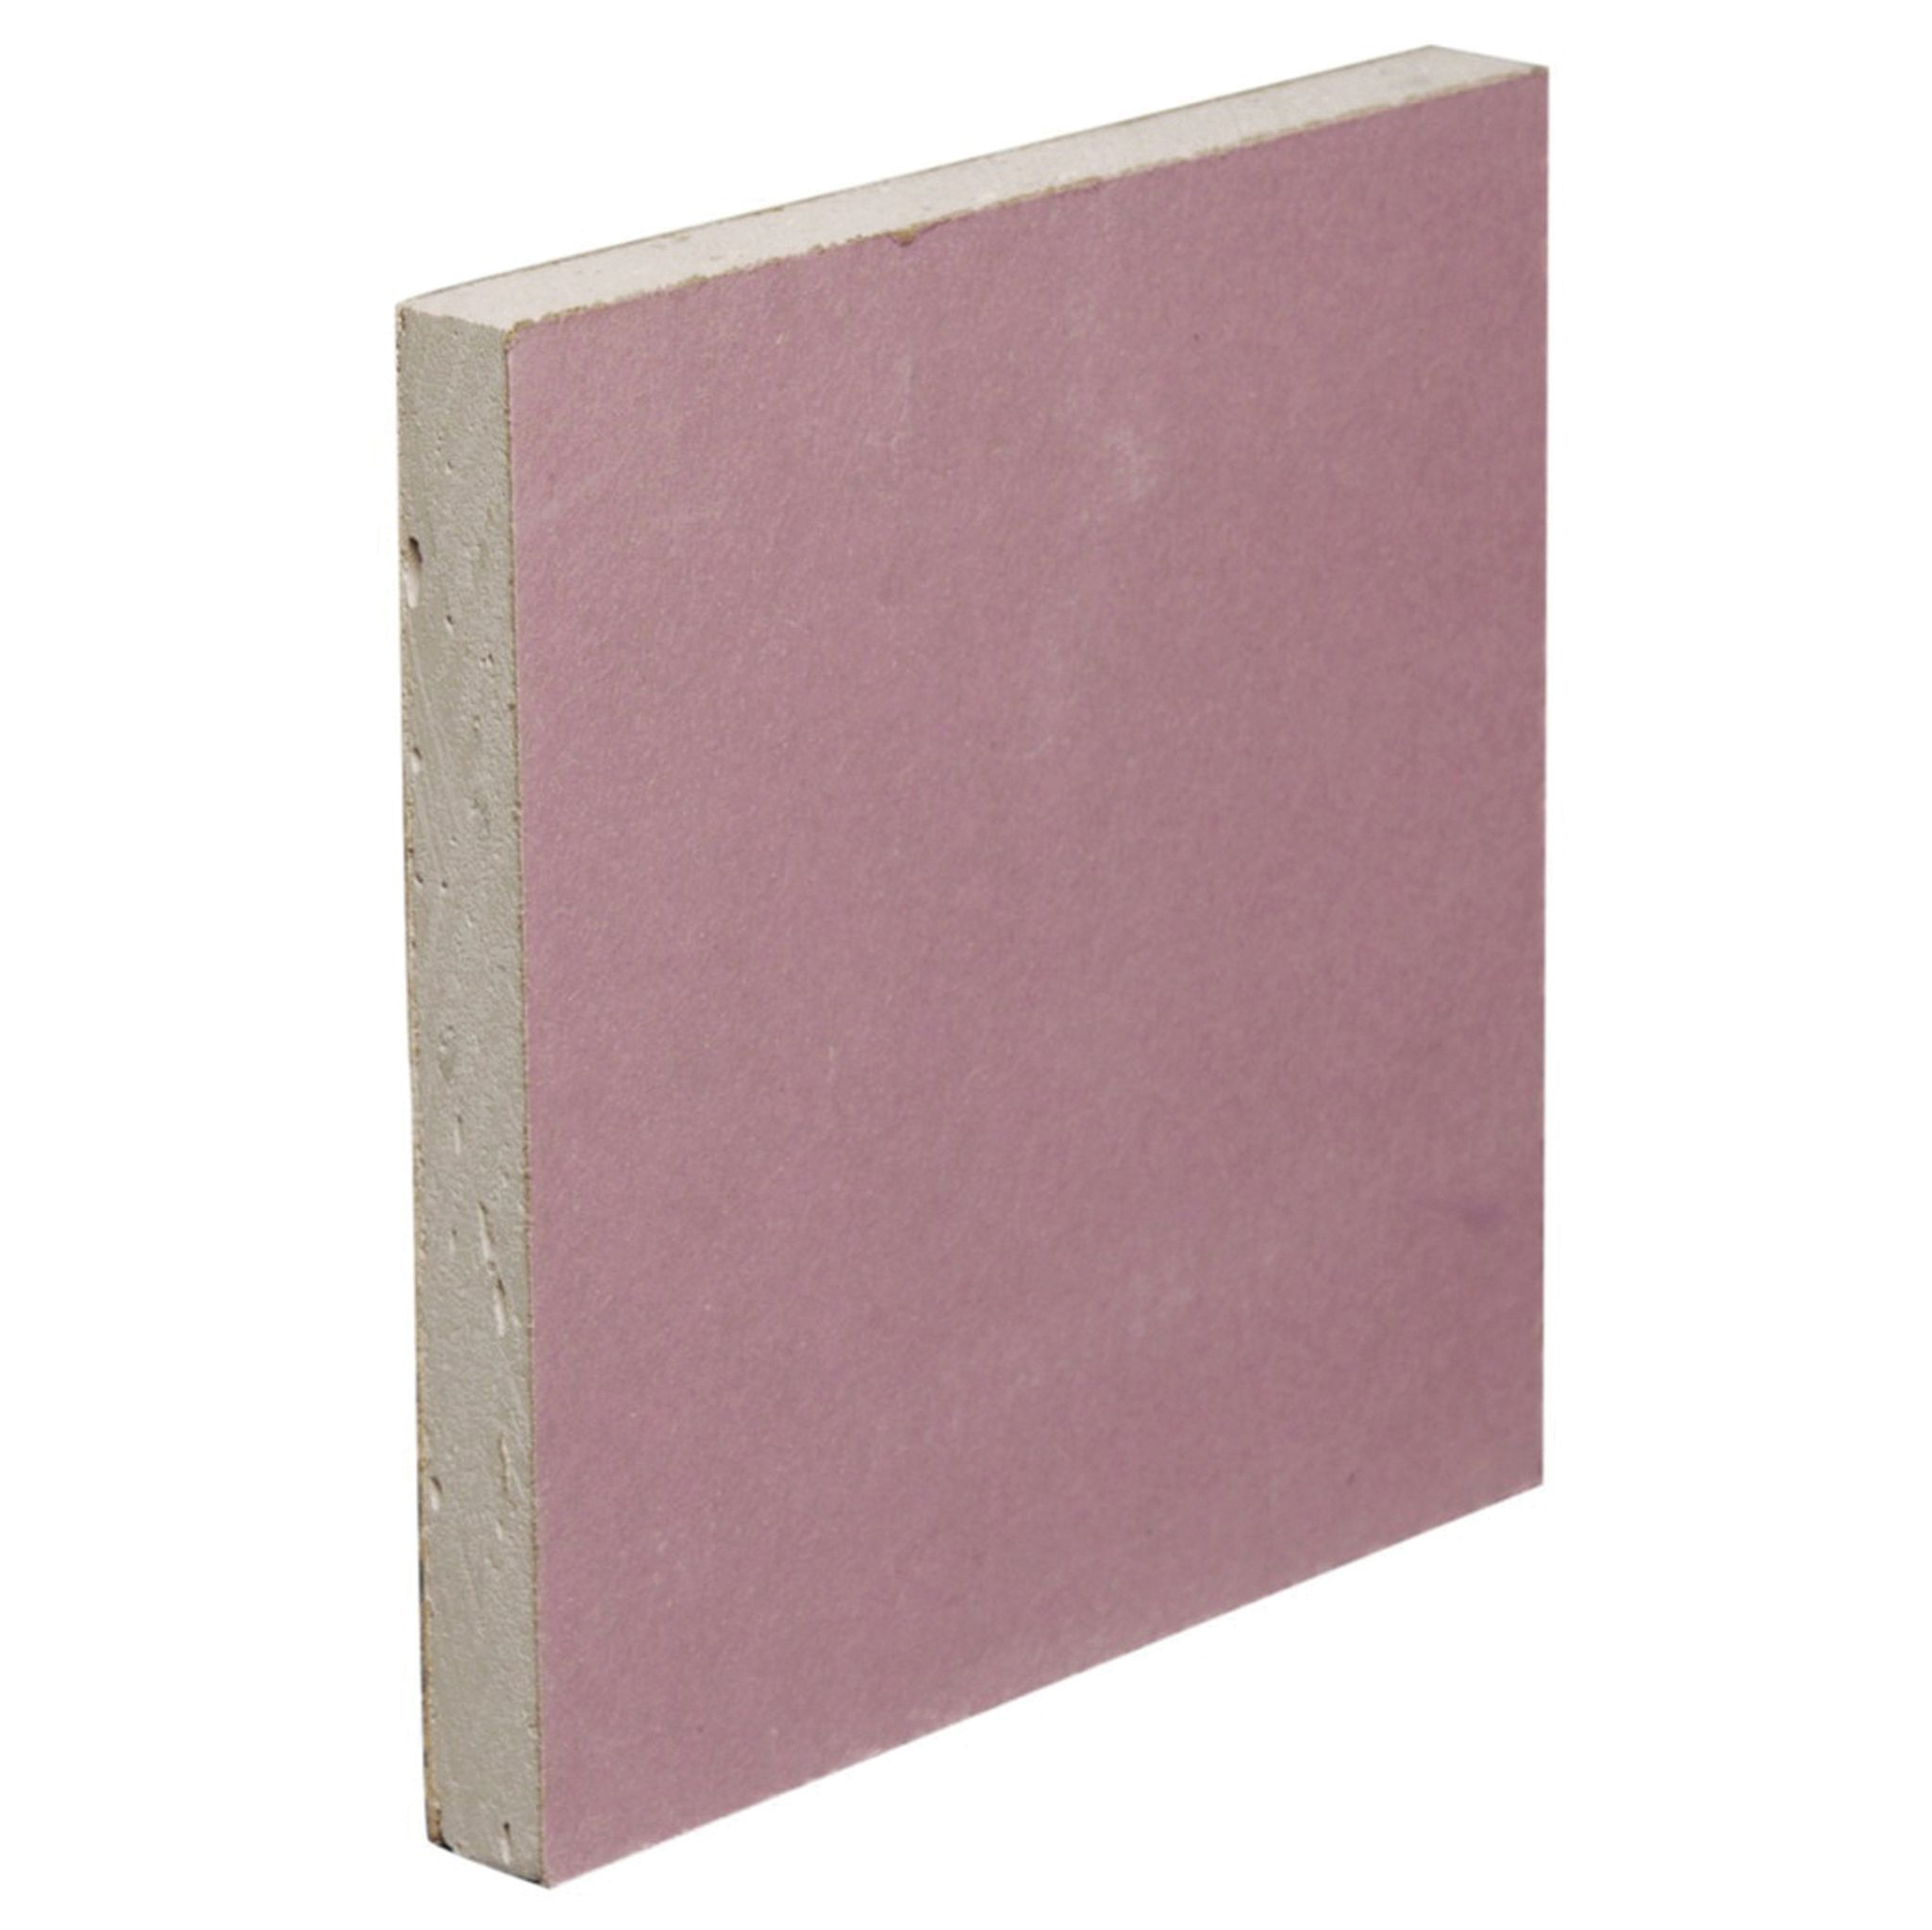 Gyproc Fireline Square Edge Plasterboard L 2400mm W